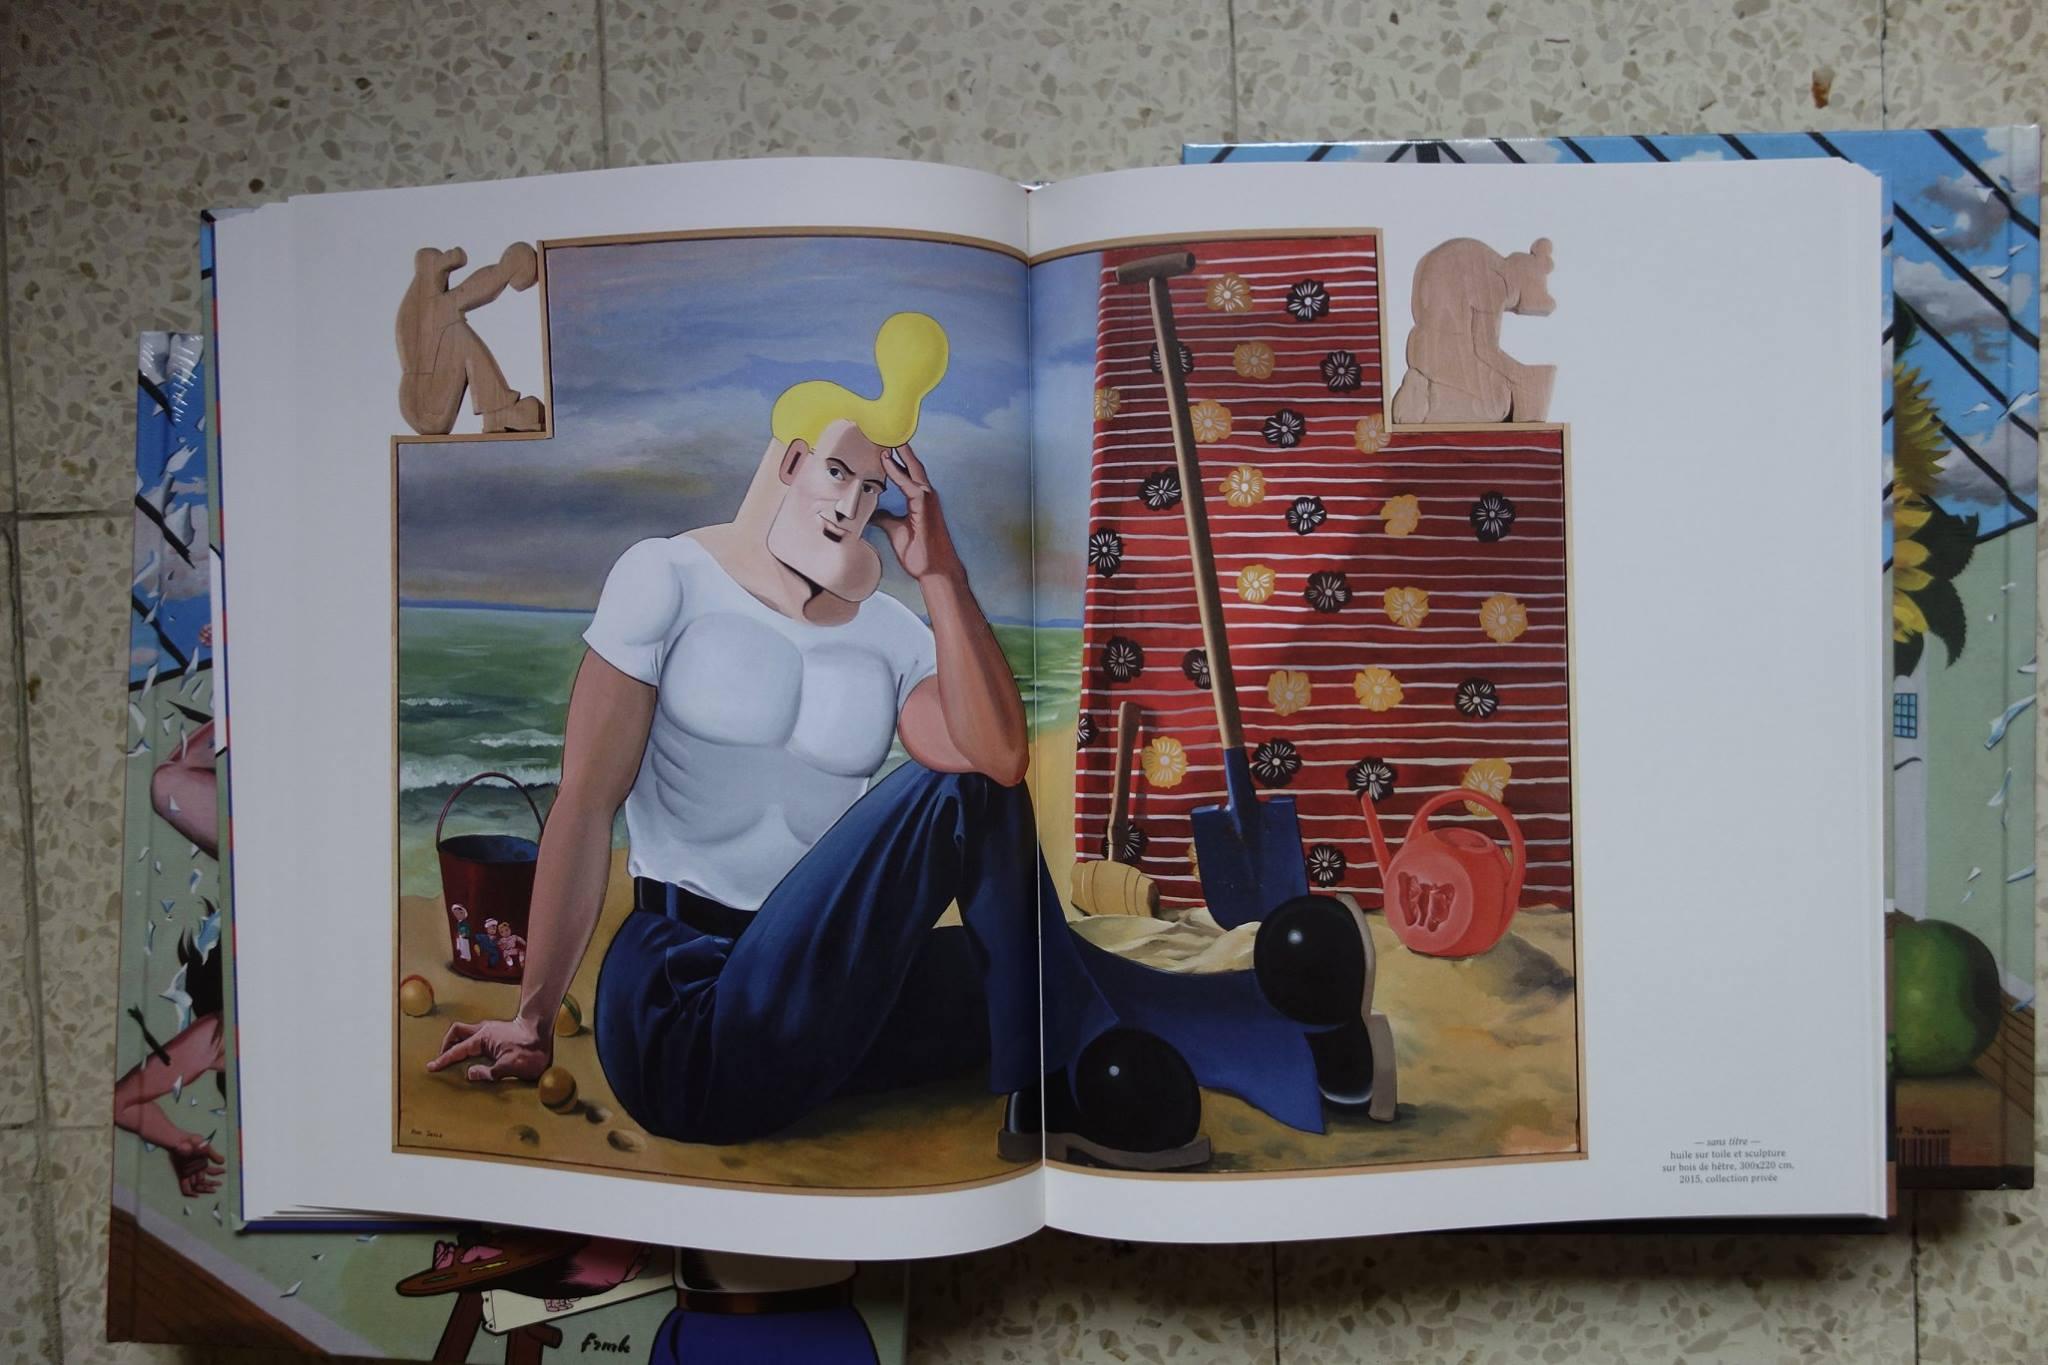 Cowboy Henk - L'art actuel - Herr Seele - Kamagurka - Plage